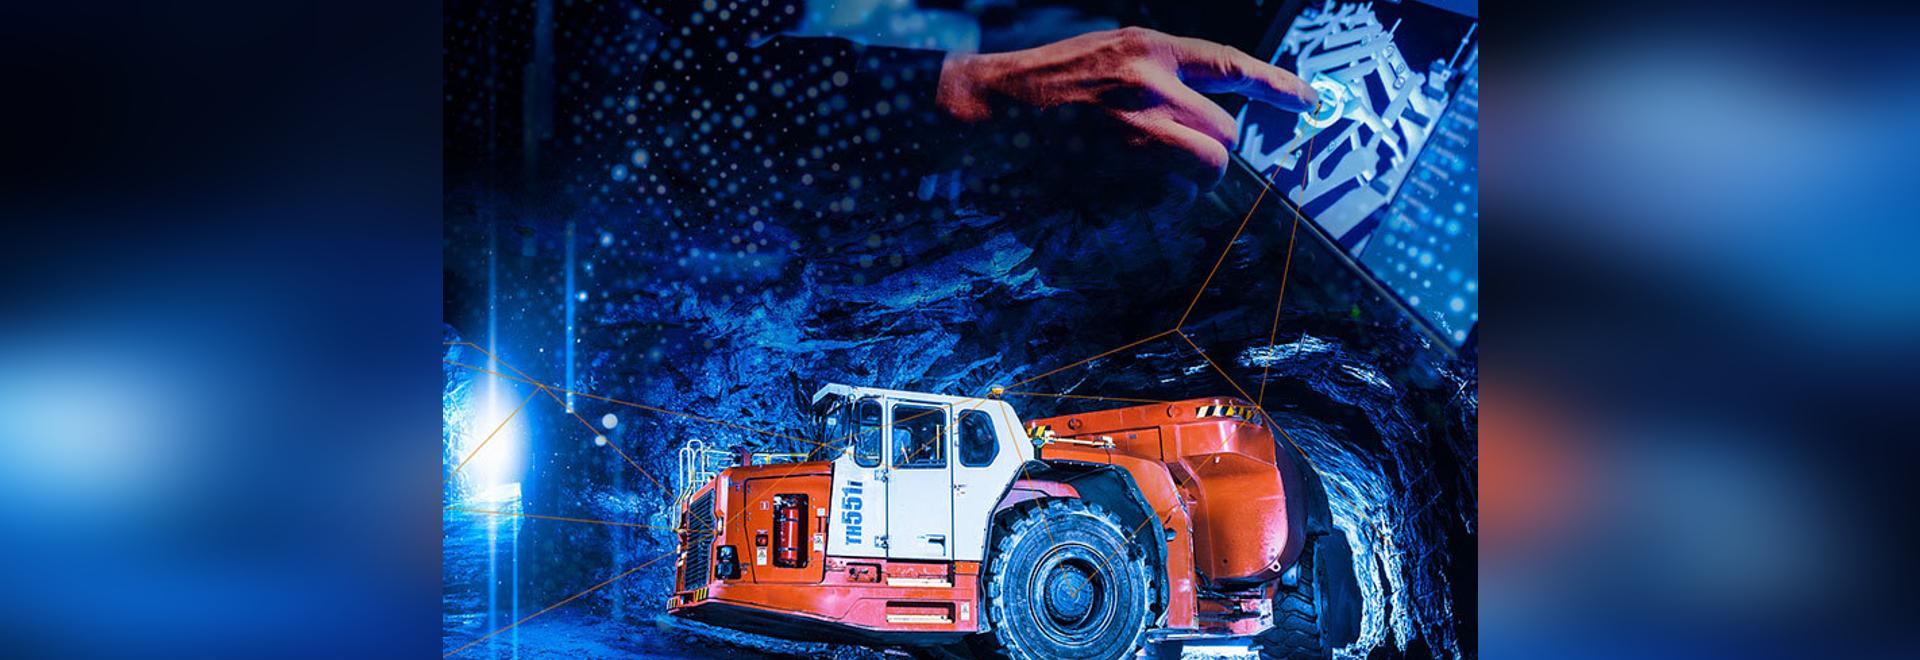 Sandvik Mining and Rock Technology ist Gastgeber der virtuellen Veranstaltung Innovation im Bergbau, 29.-30. September 2020